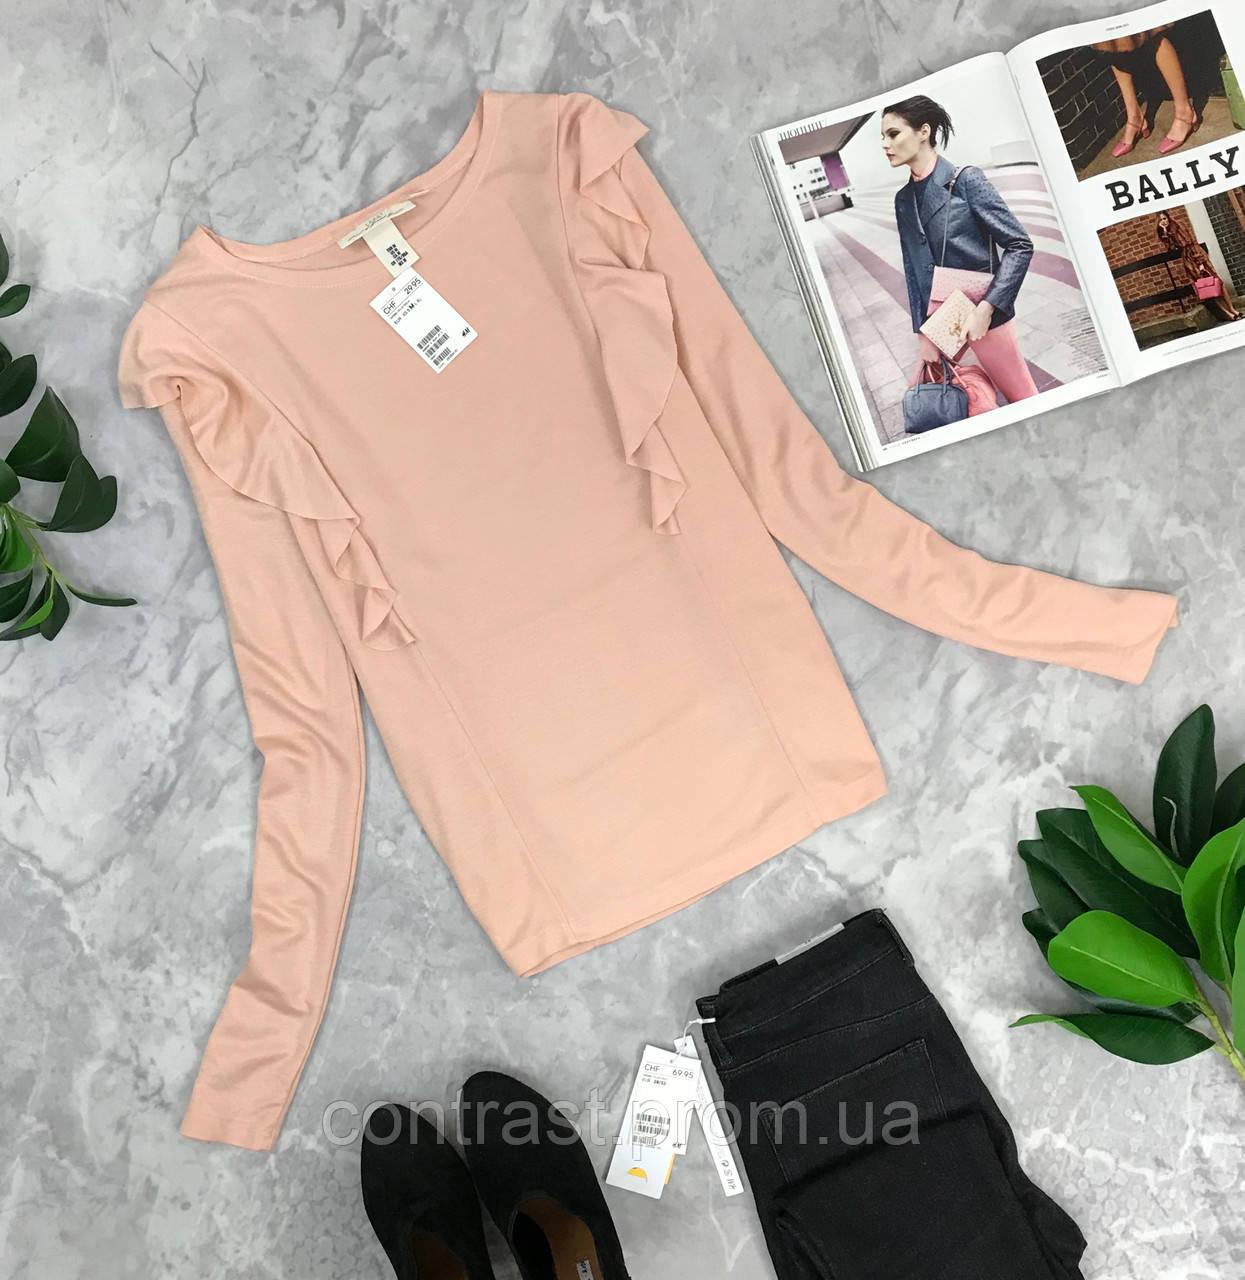 Нюдовый блуза с воланами H&M  BL1845061 H&M